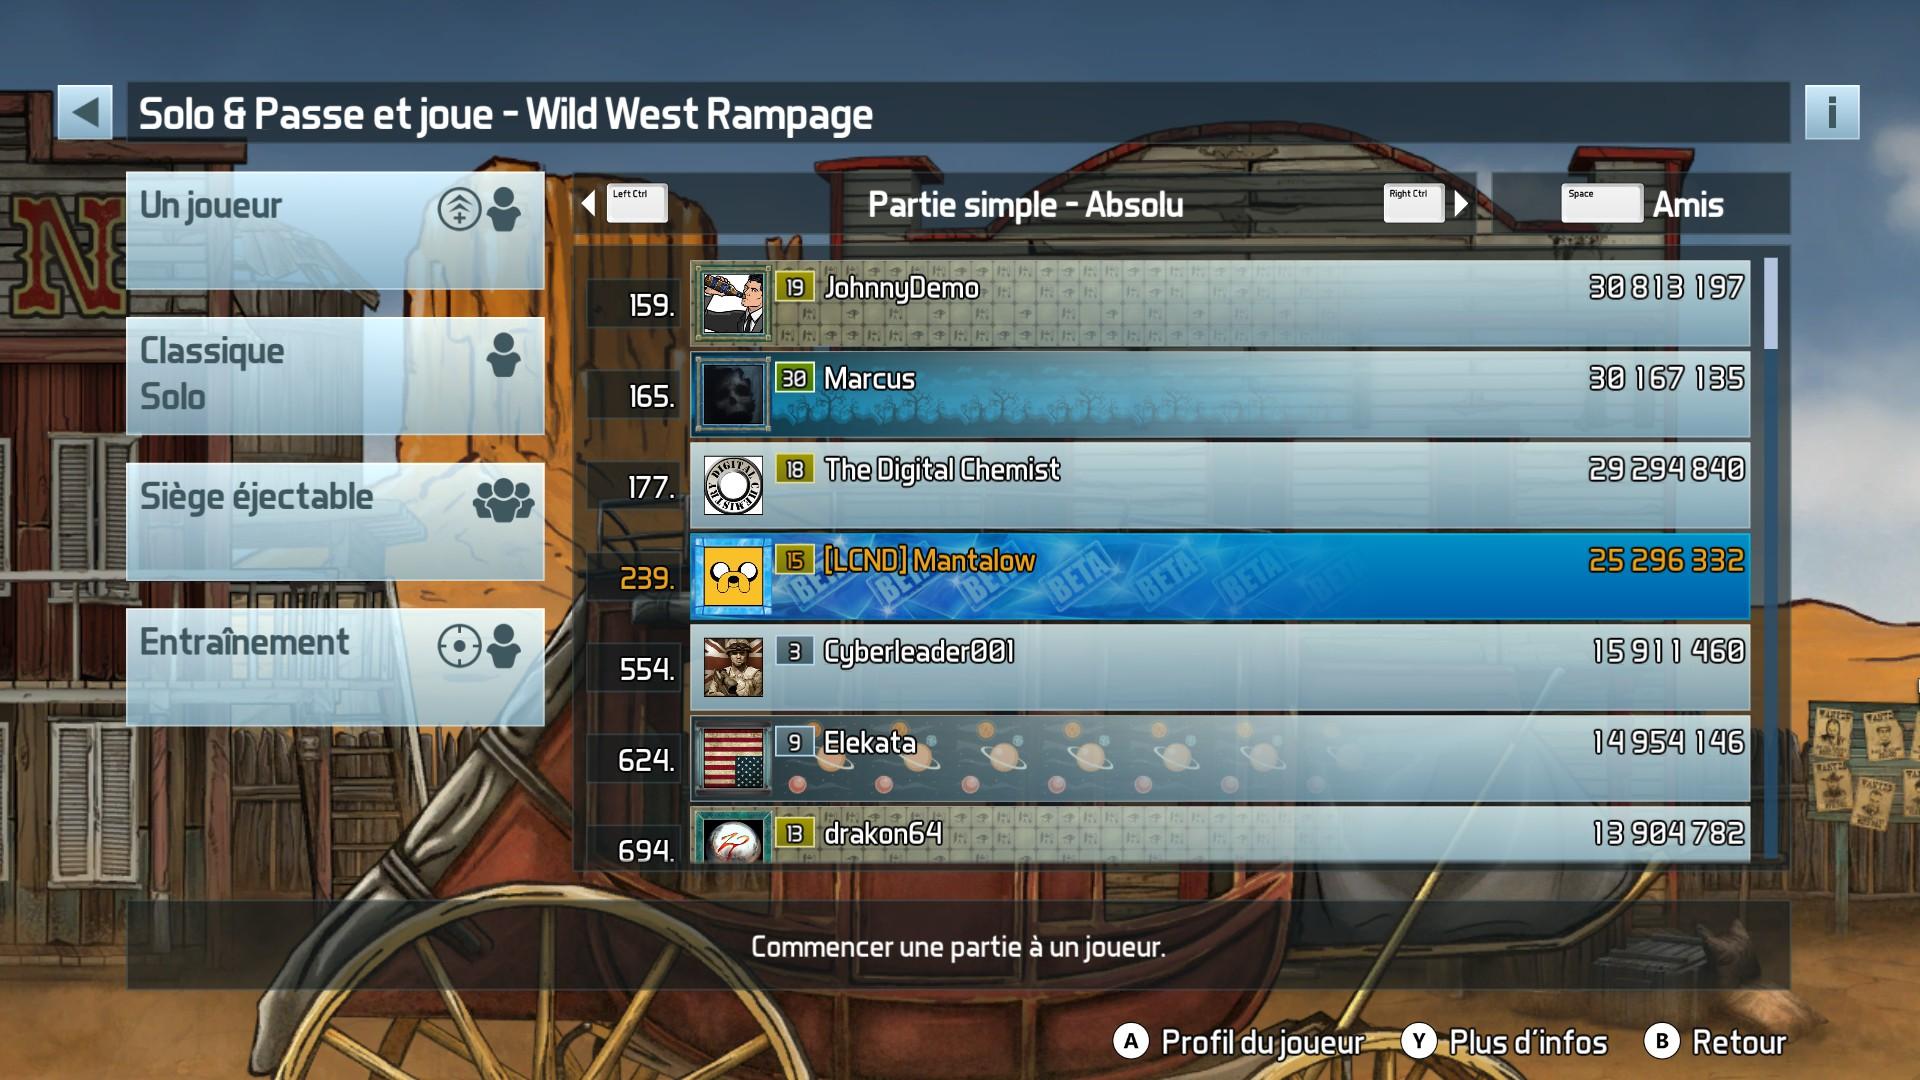 Mantalow: Pinball FX3: Wild West Rampage (PC) 25,296,332 points on 2017-10-03 03:58:57